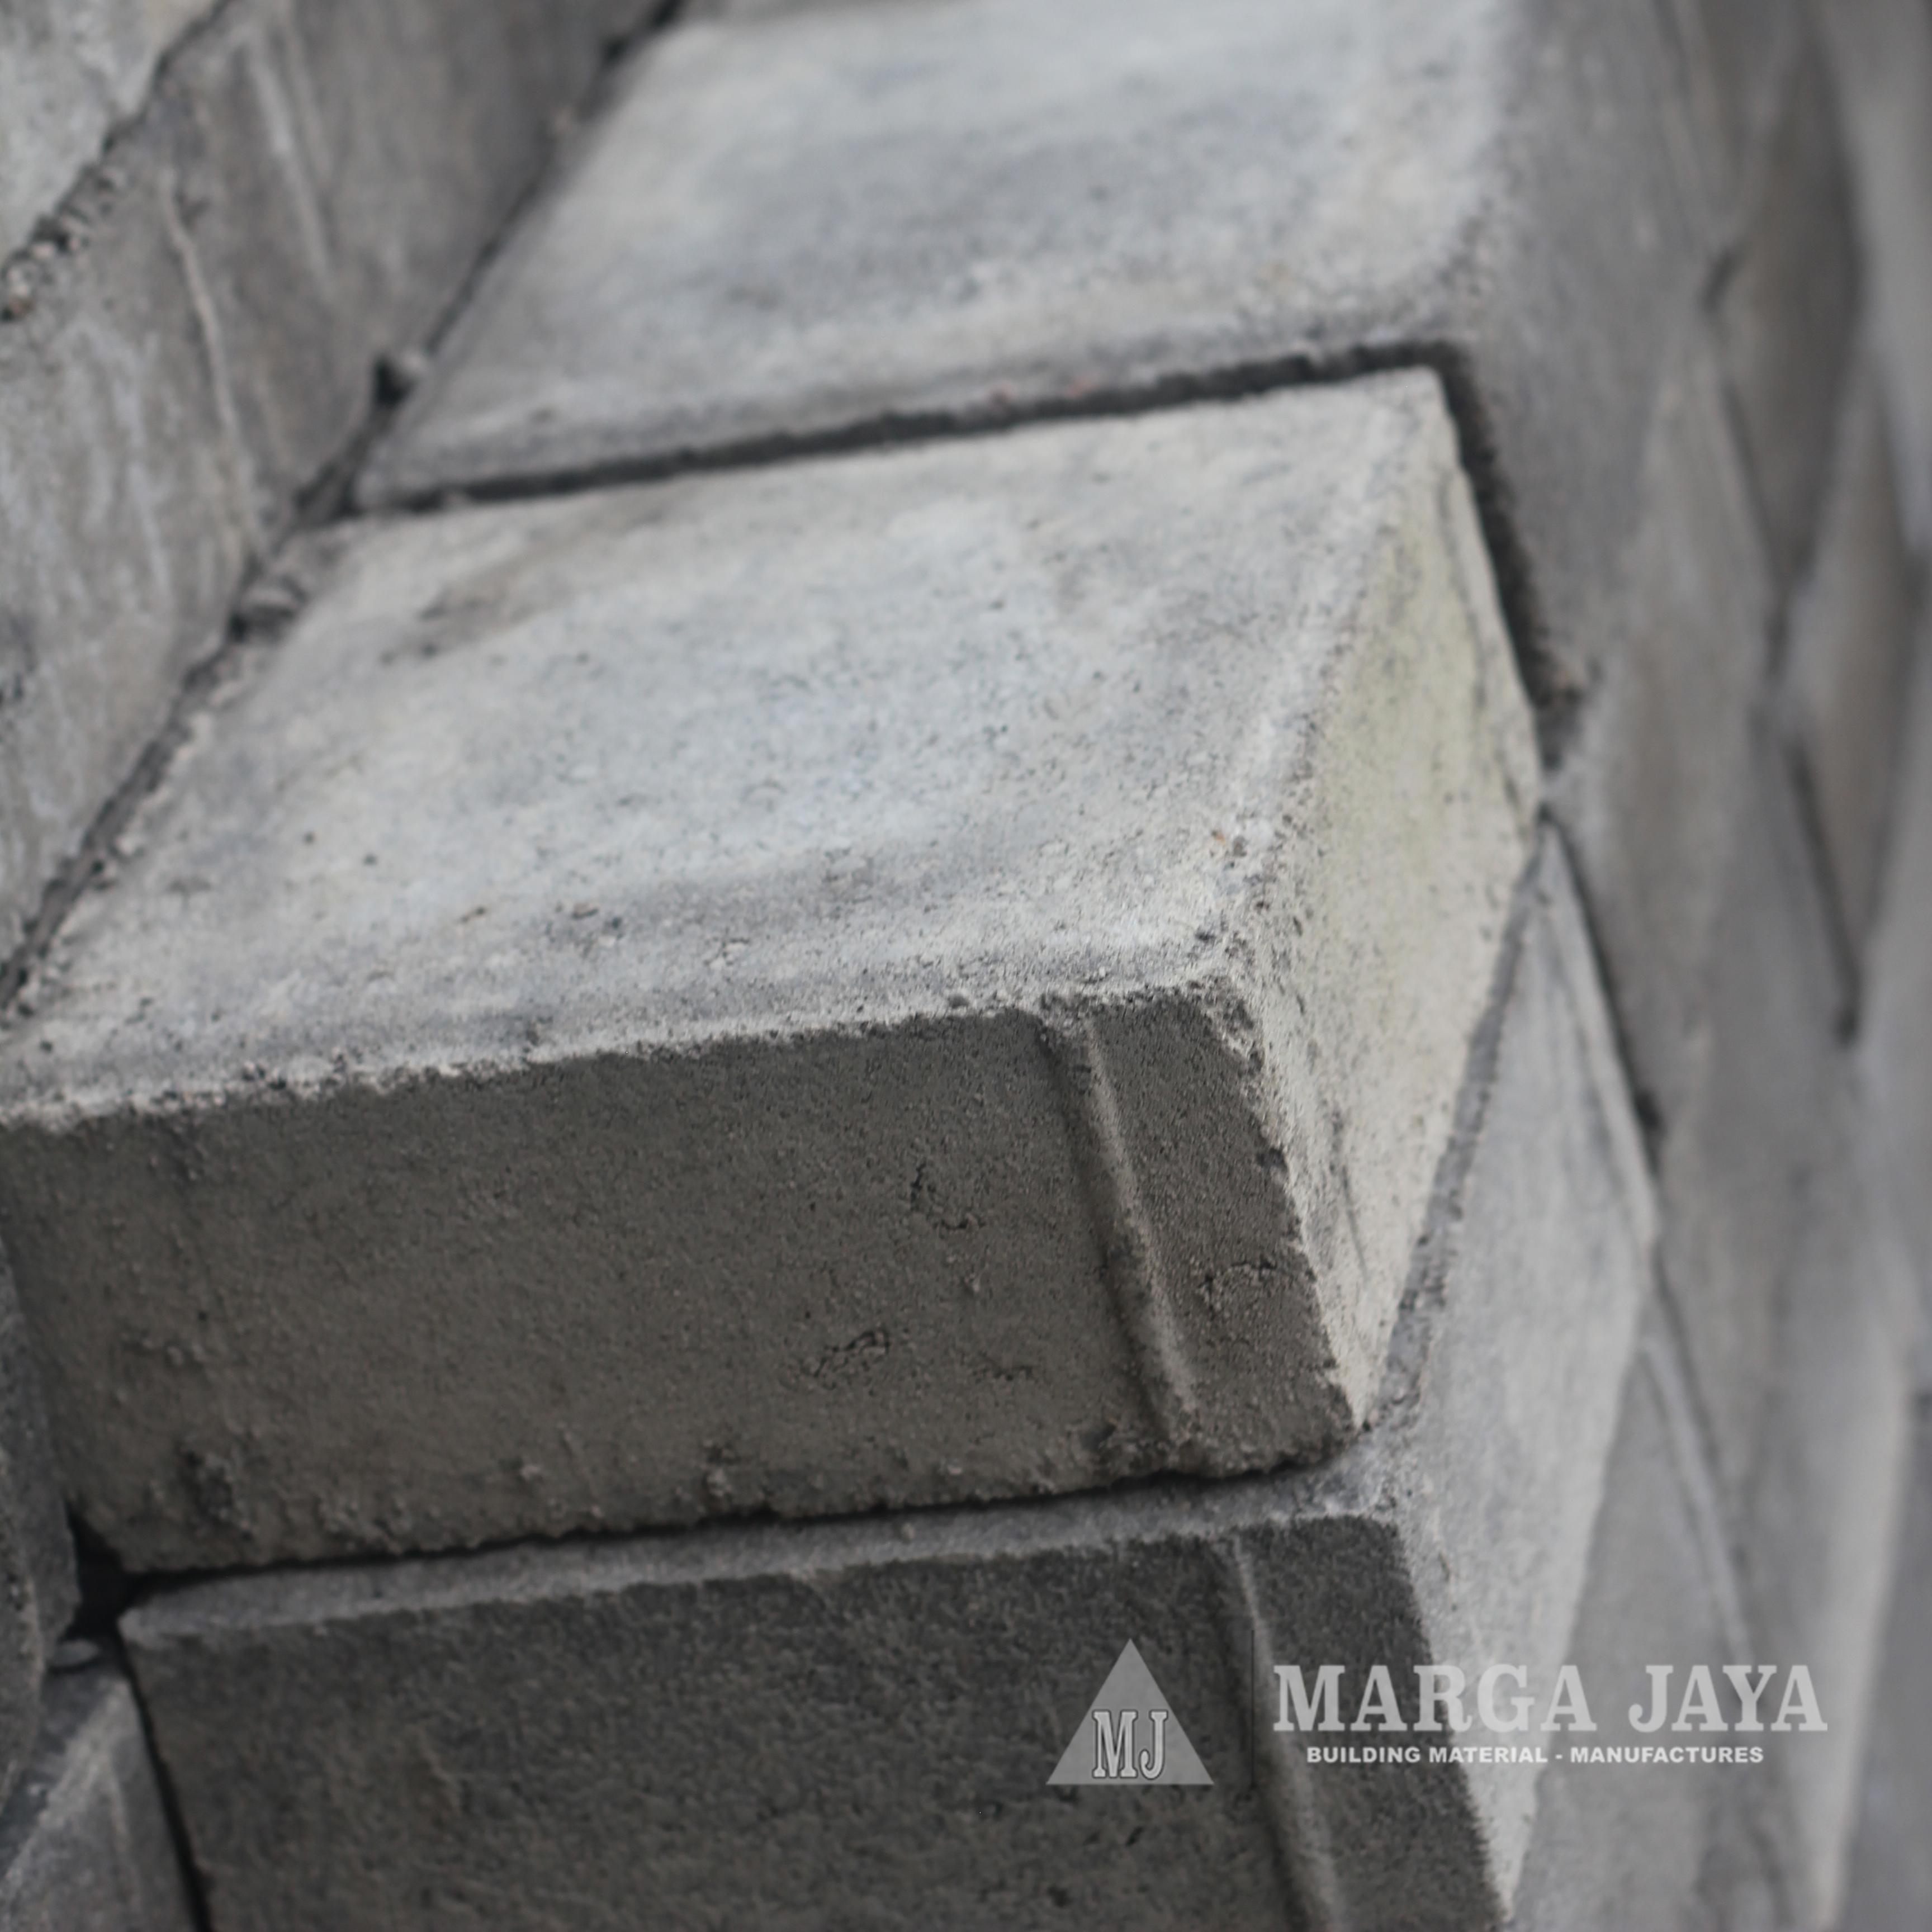 Harga Paving Block Murah Yogyakarta